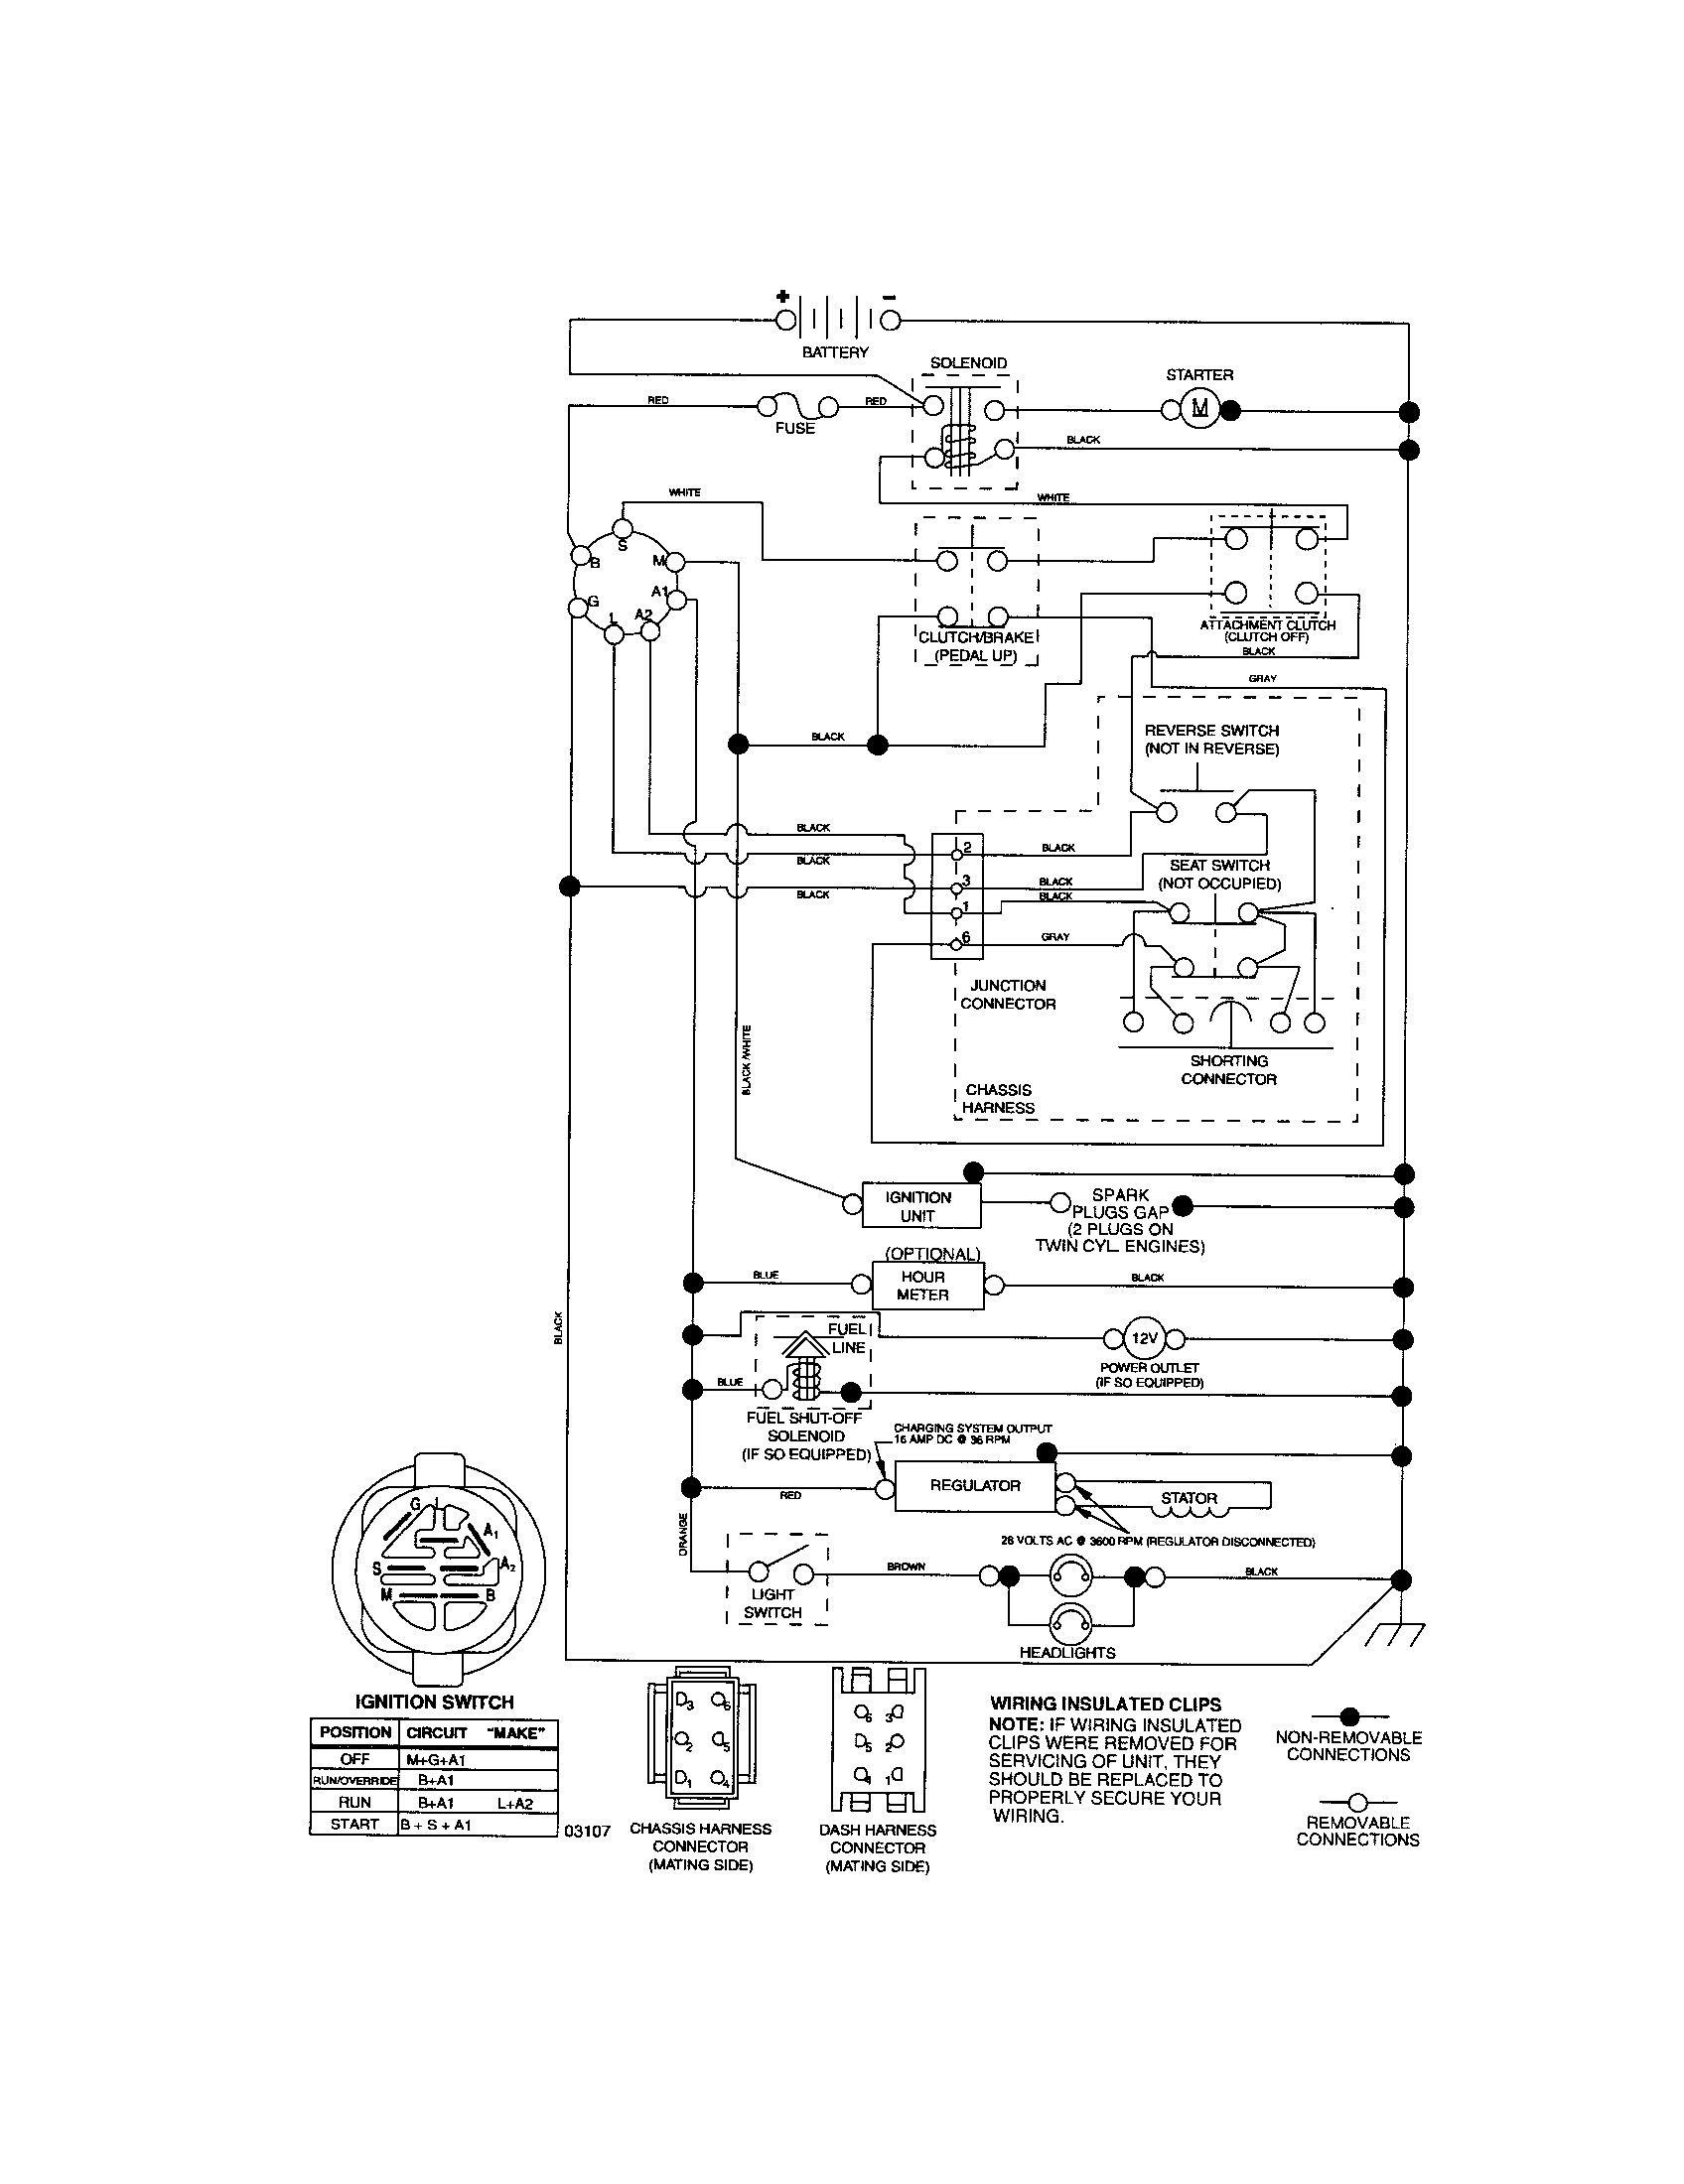 Honda Small Engine Carburetor Diagram Craftsman Riding Mower Electrical Diagram Of Honda Small Engine Carburetor Diagram